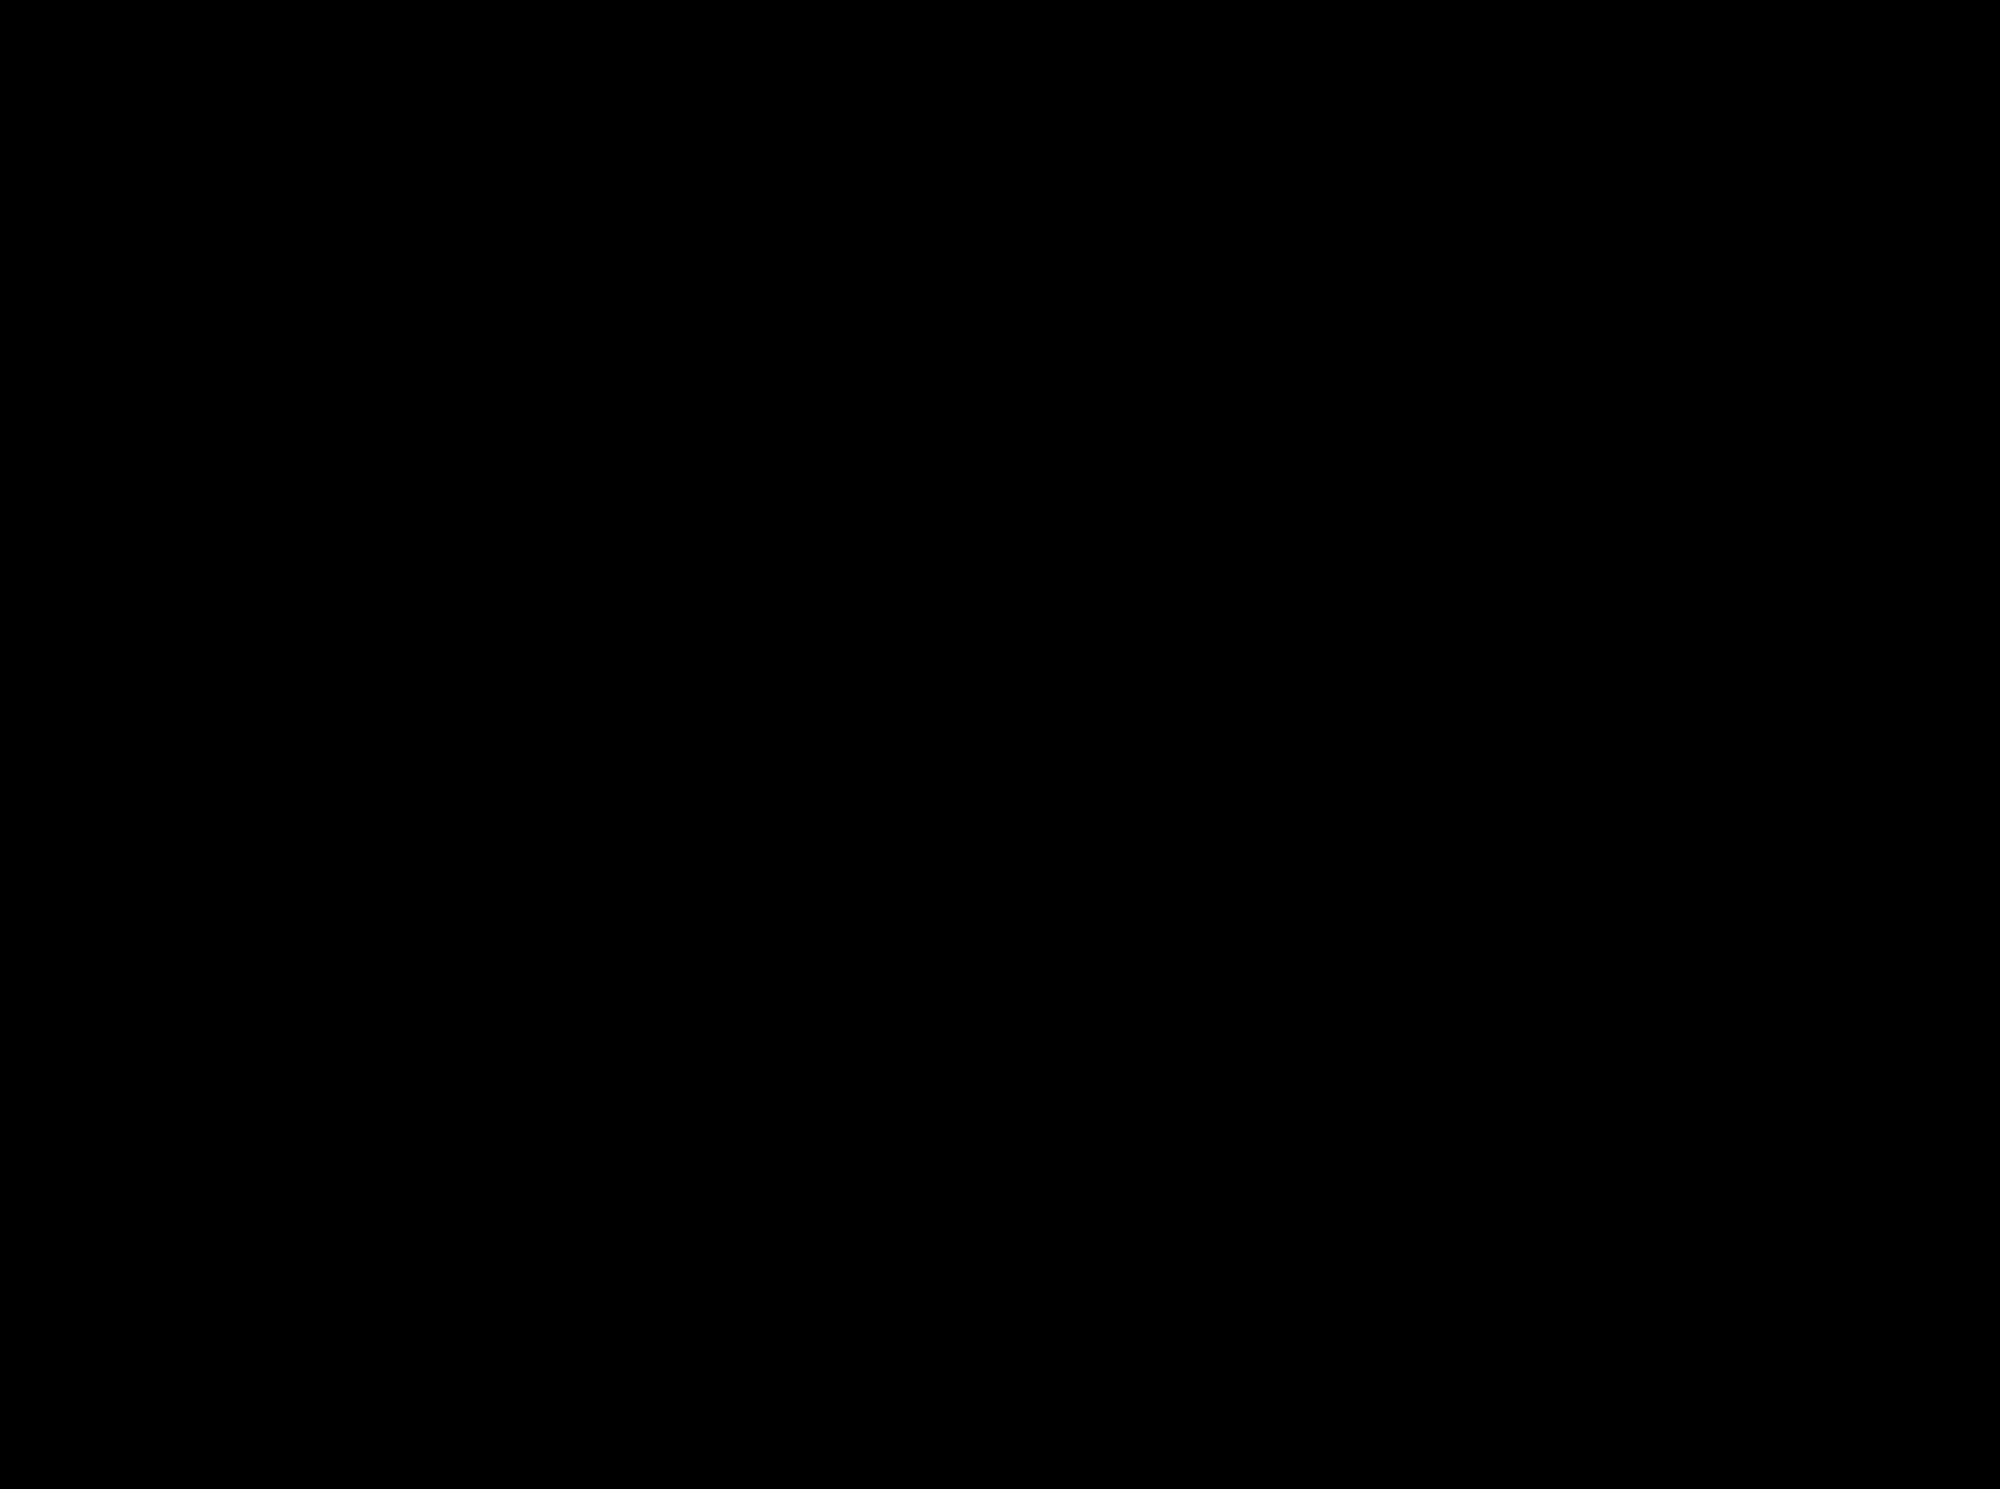 transparent astronomy drawing scientific illustration #89371864